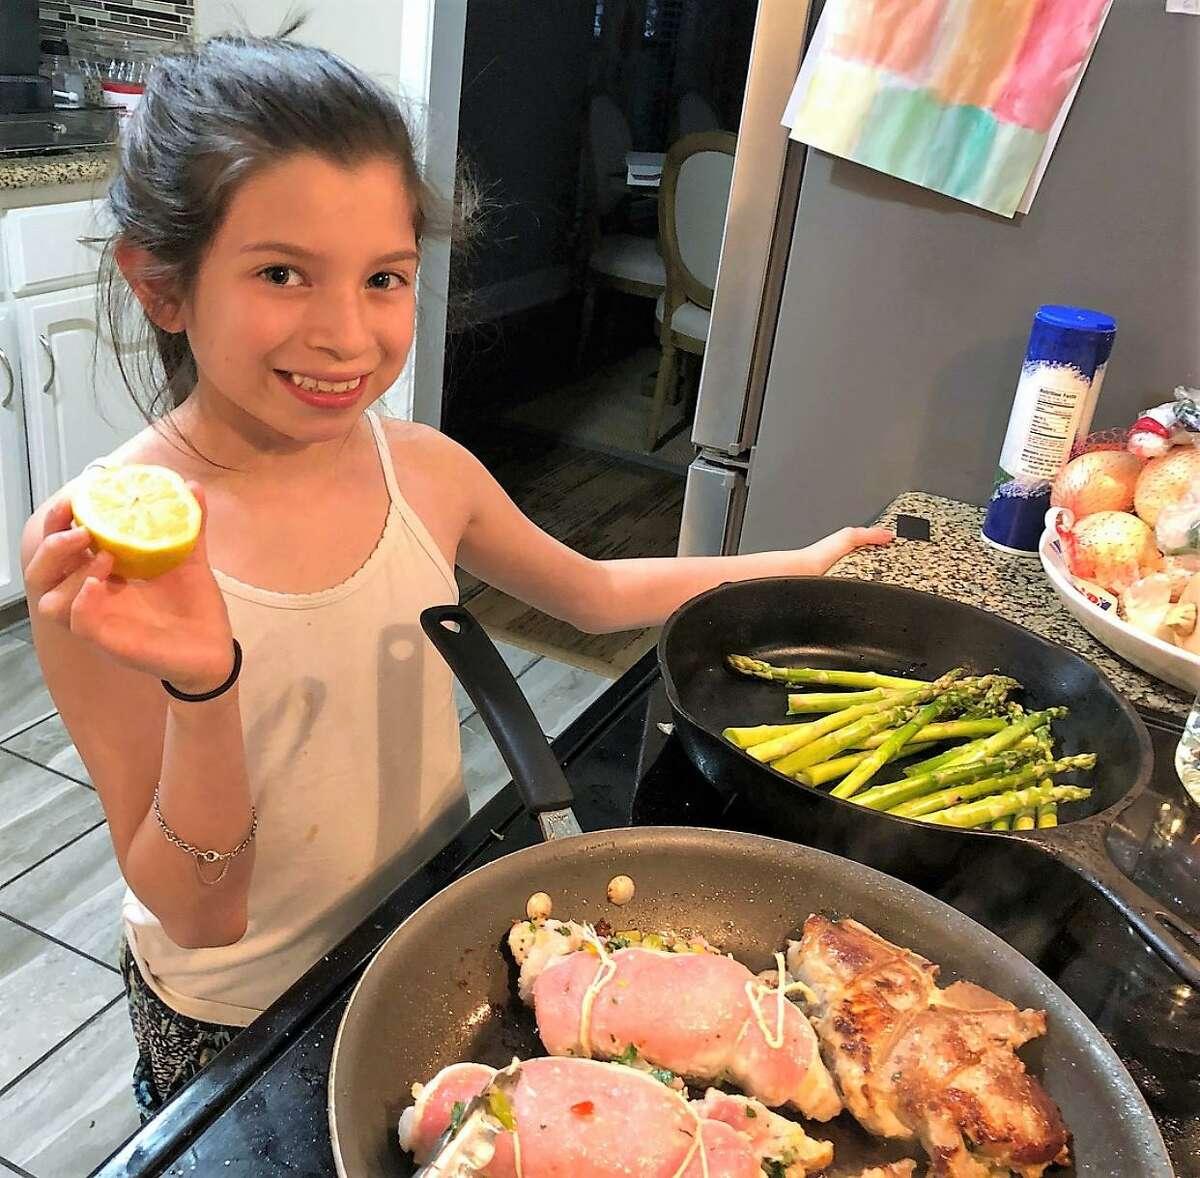 S.A. contestant Nayeli Mendoza prepares stuffed pork chops.